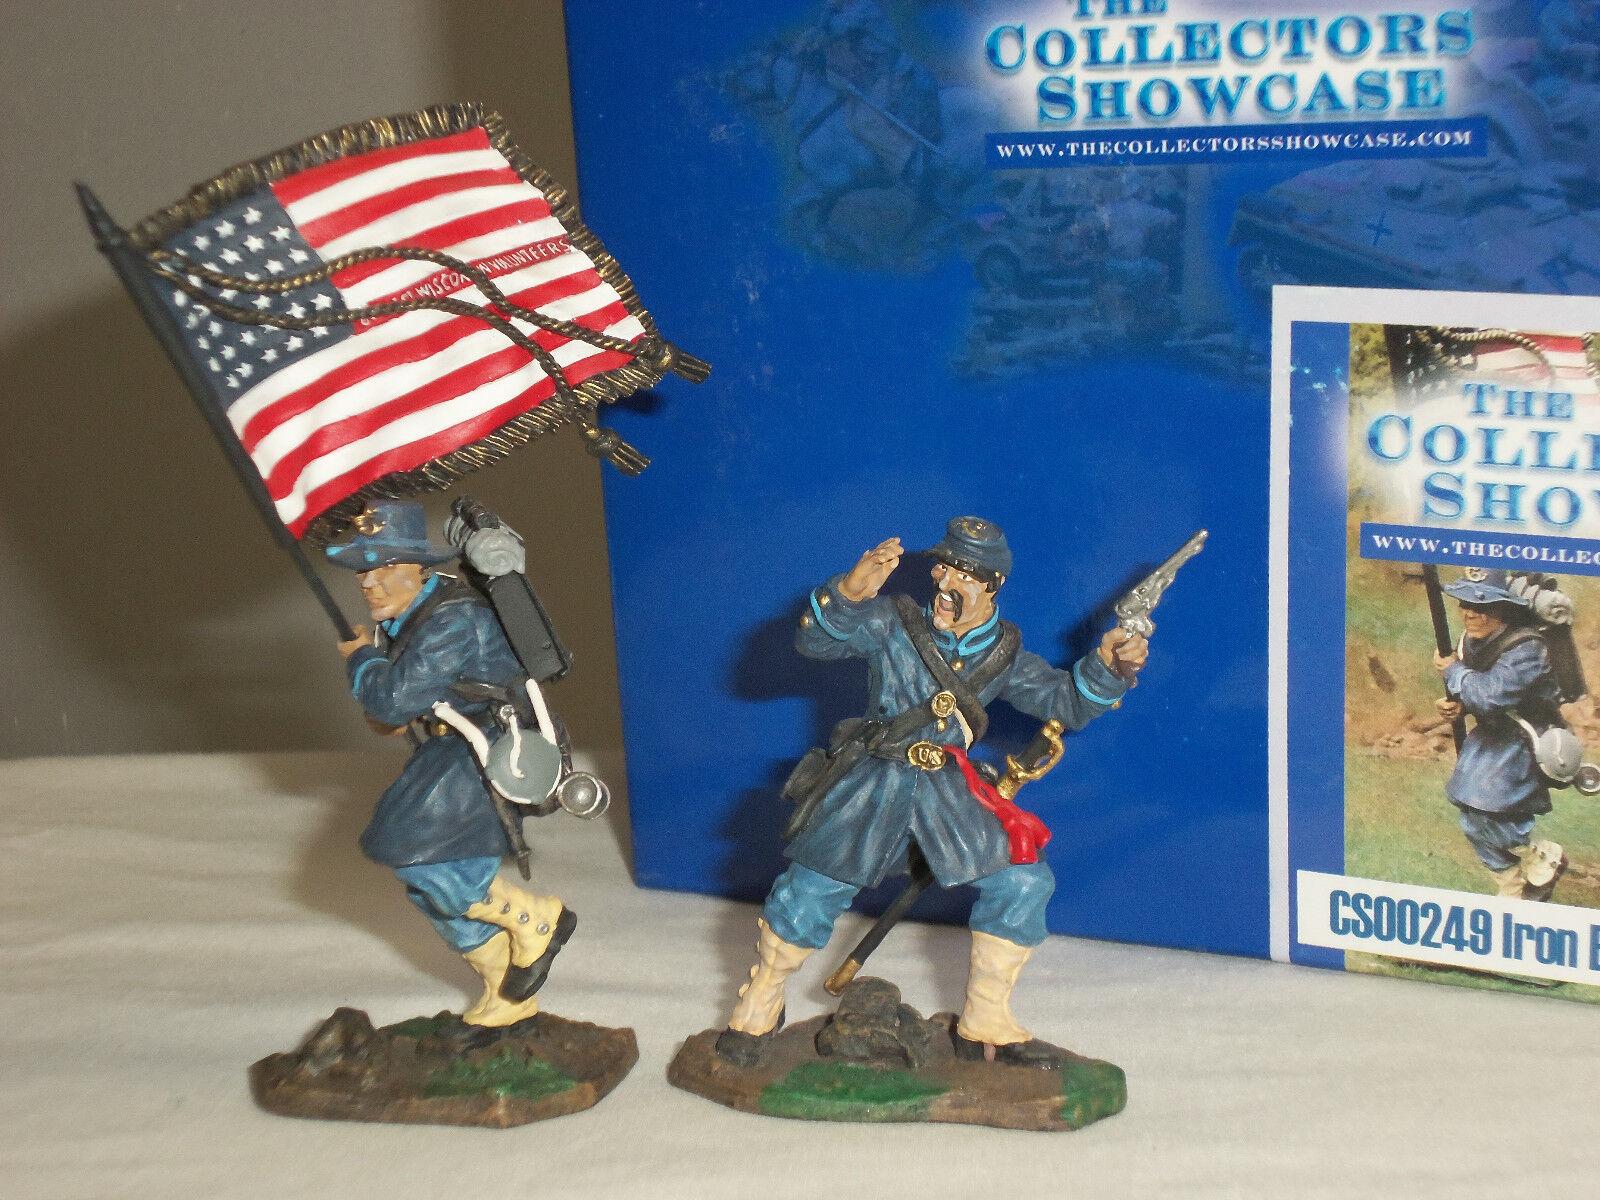 COLLECTORS SHOWCASE CS00249 IRON BRIGADE METAL TOY SOLDIER FIGURE COMMAND SET